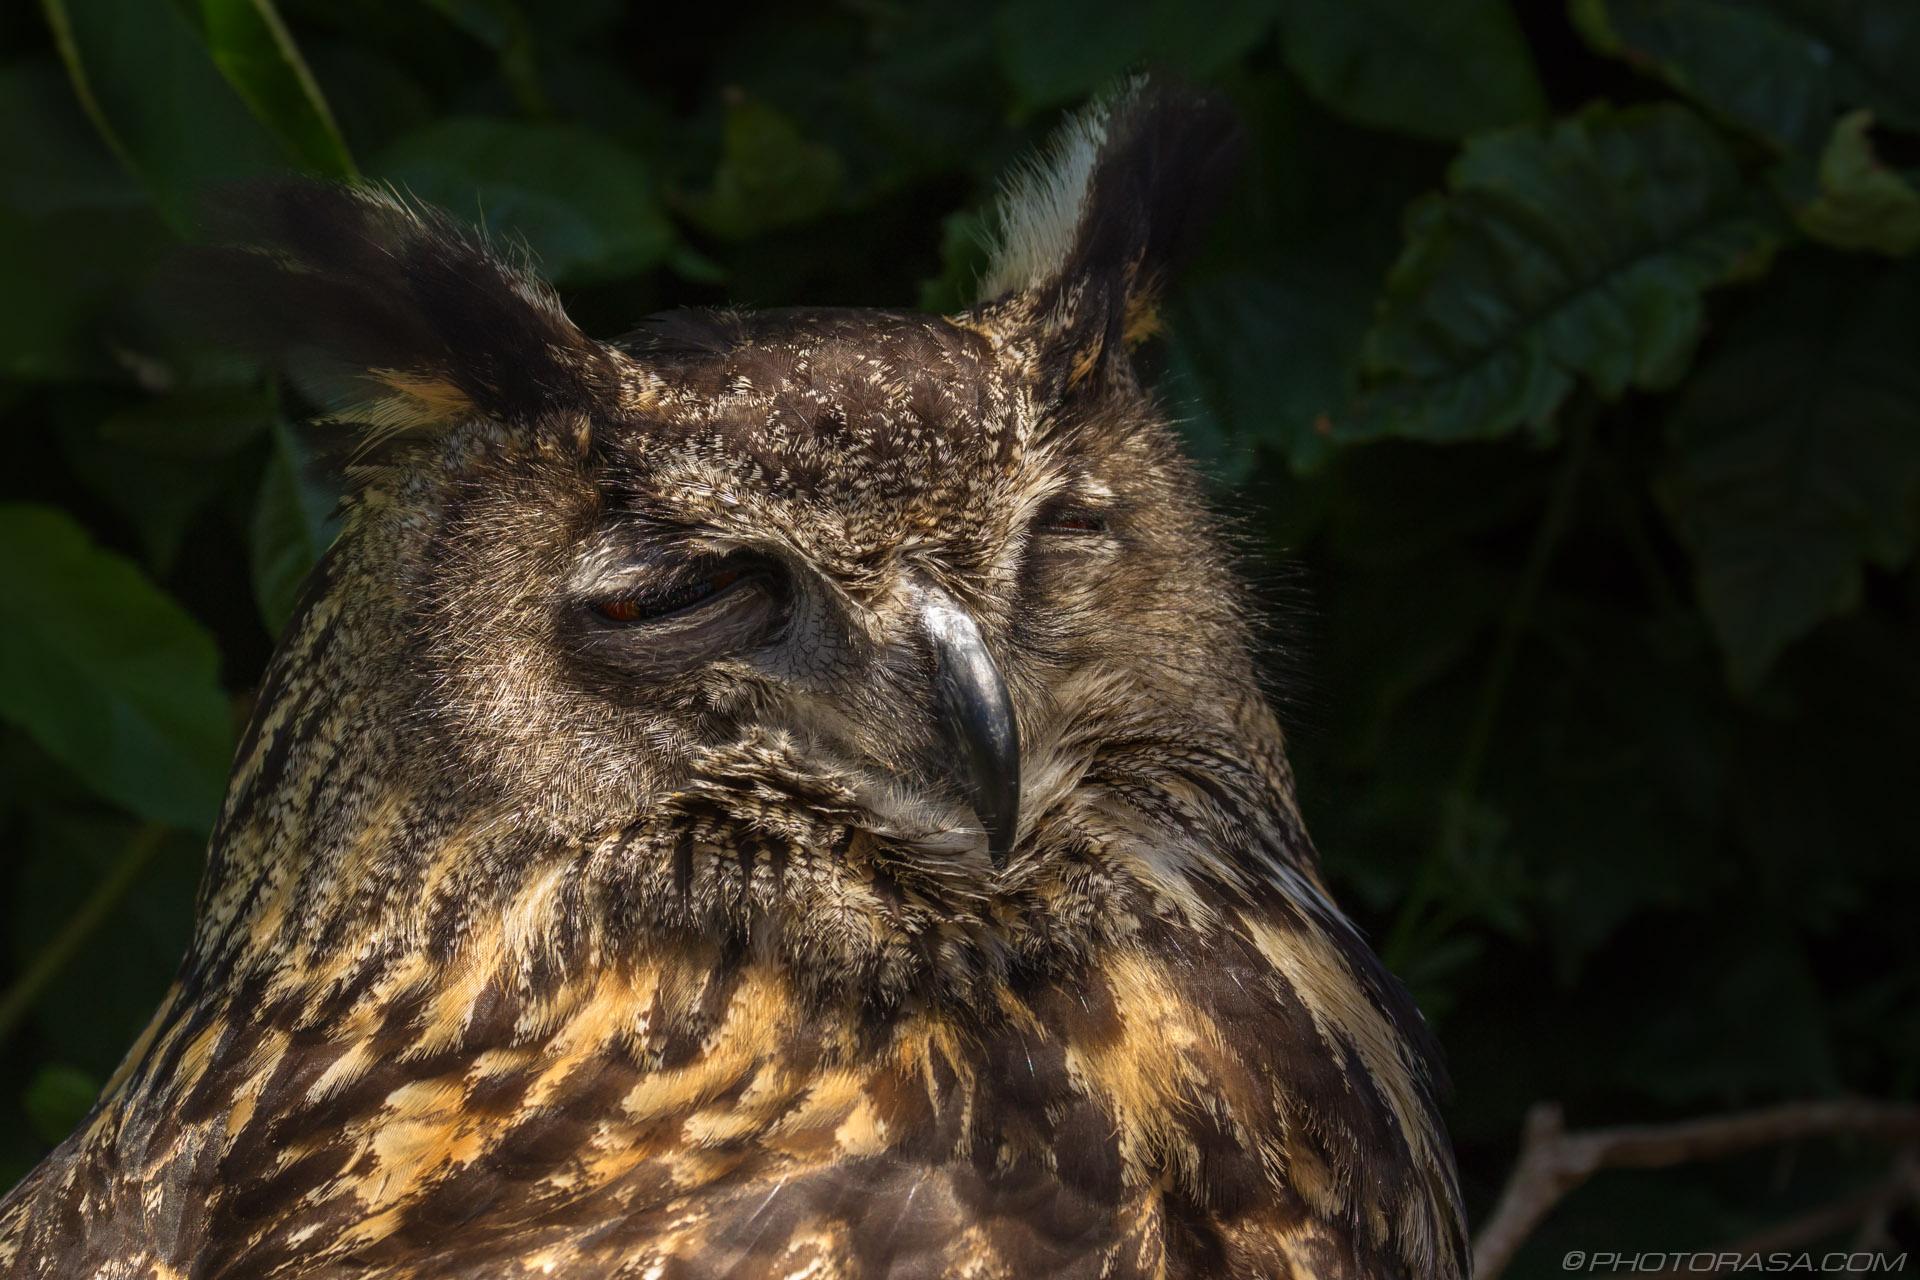 https://photorasa.com/owls/european-eagle-owl-with-eyes-closed/